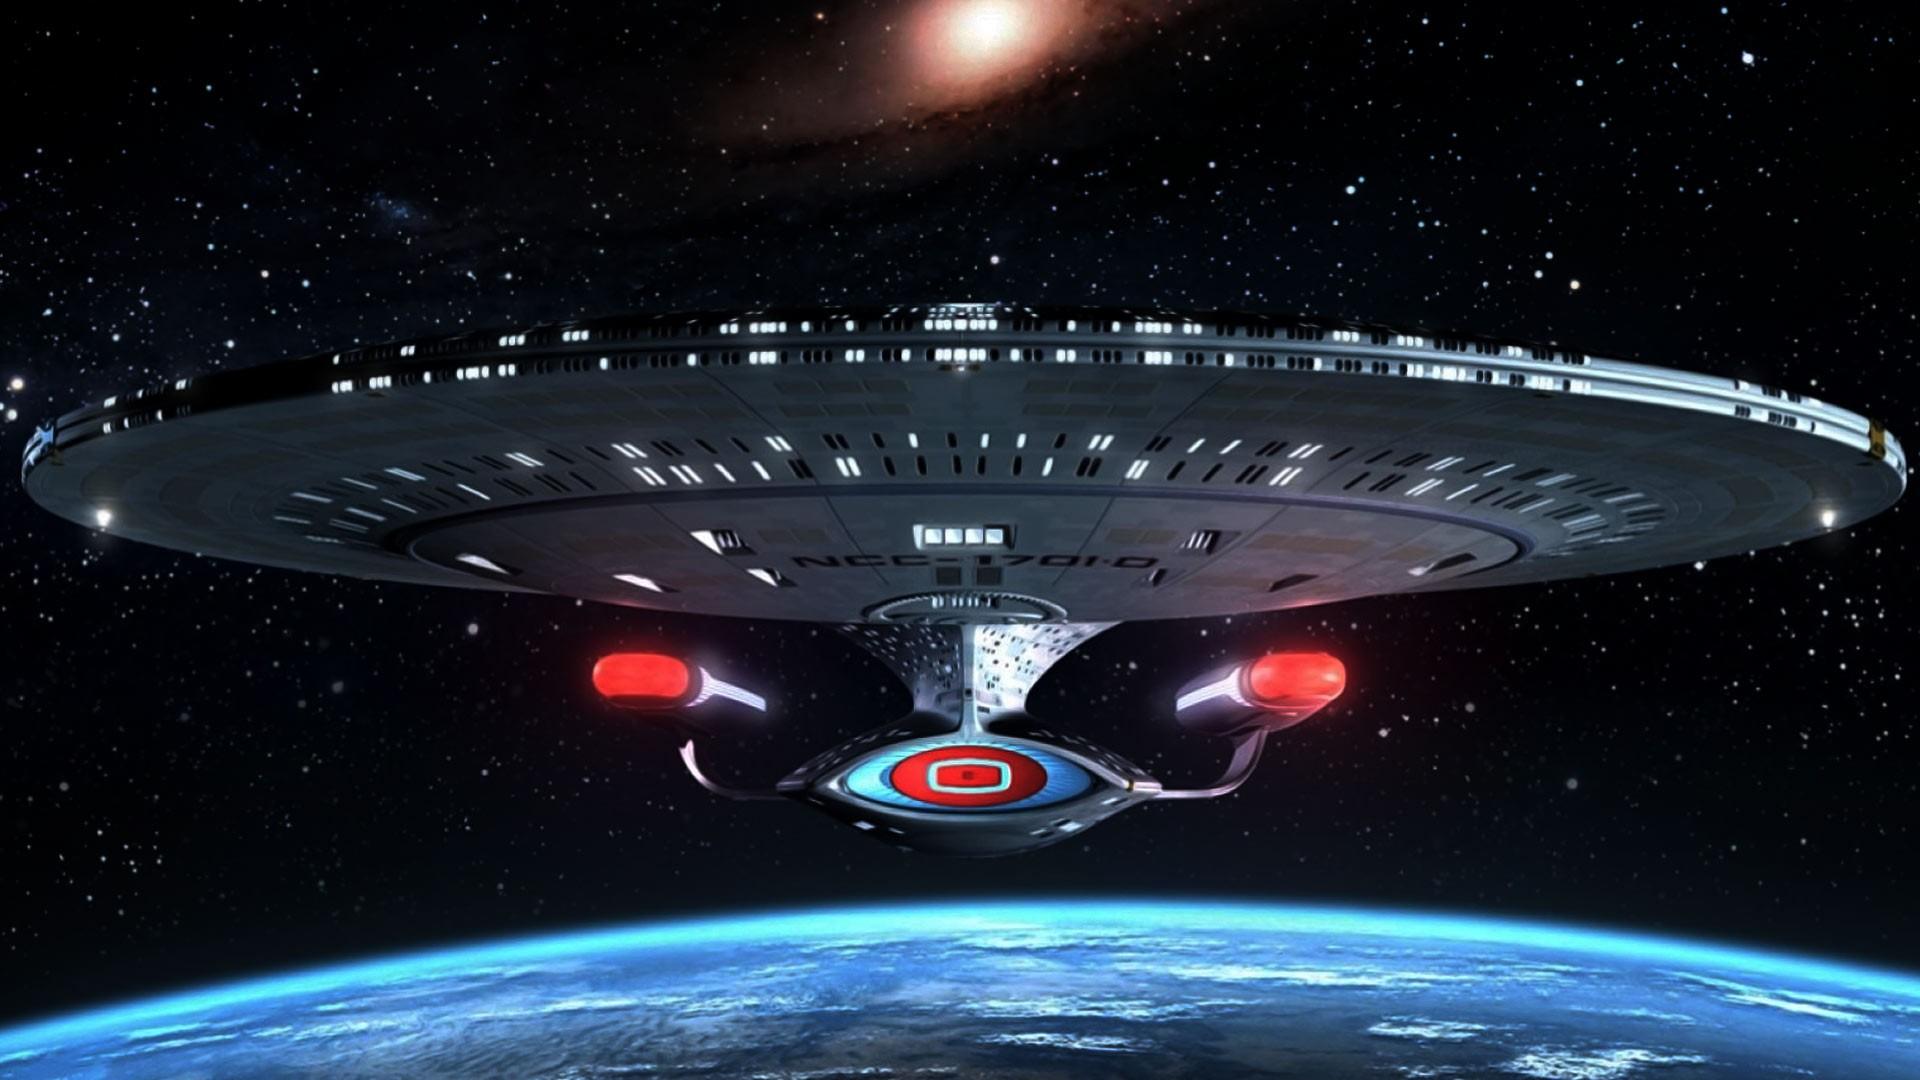 General 1920x1080 science fiction spaceship NCC-1701 Enterprise D star trek: the next generation Star Trek Ships Star Trek: TNG